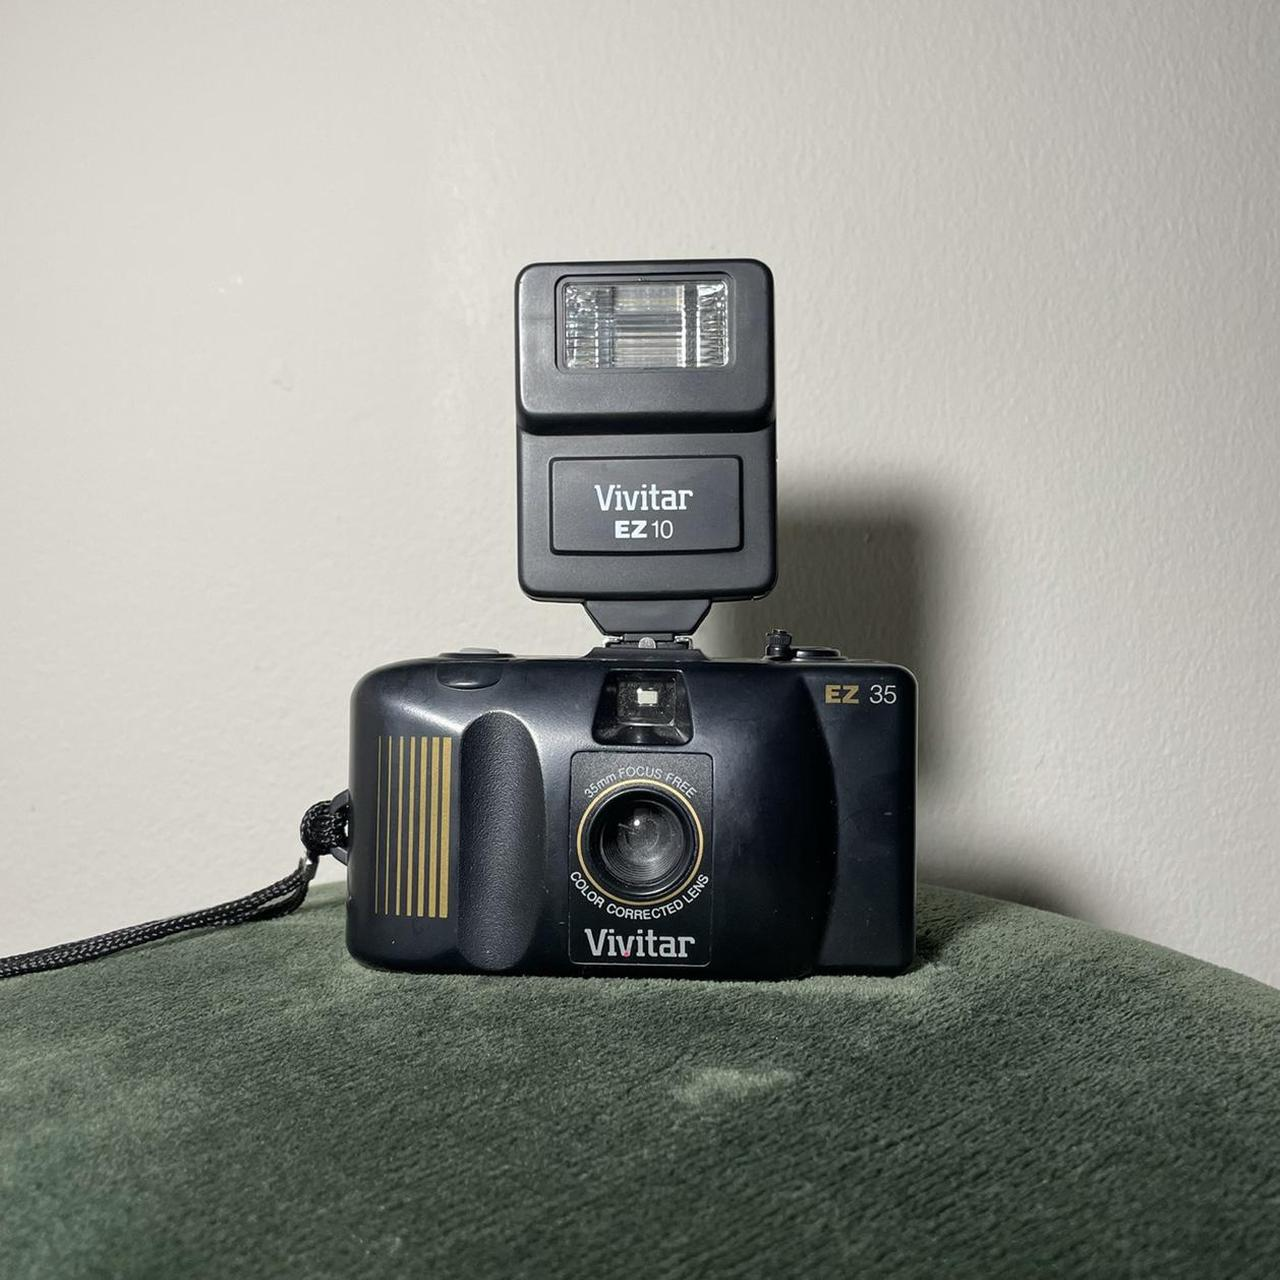 Product Image 1 - Vivitar Ez35 35mm Compact Film